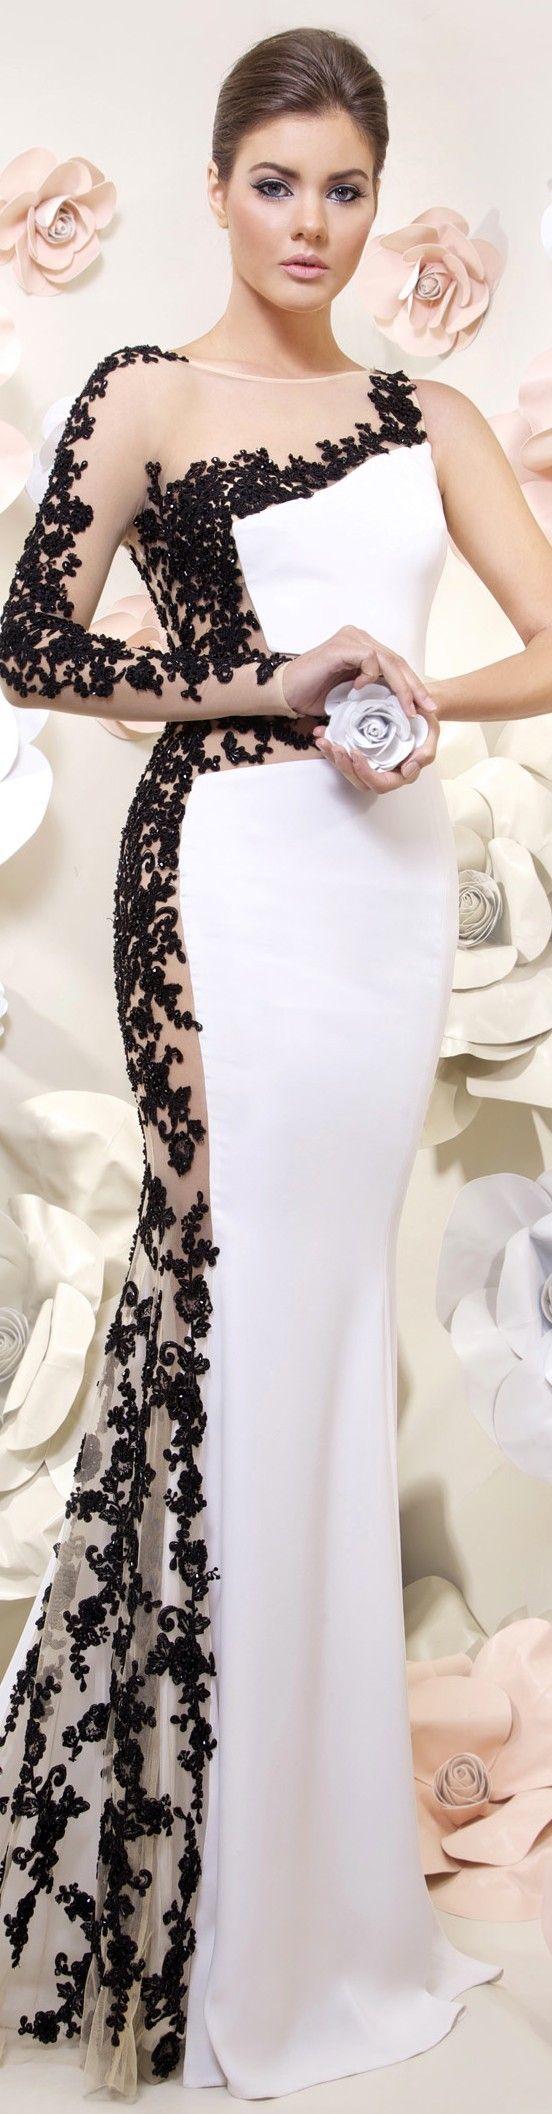 Tarek Sinno haute couture PRE-FALL 2013/2014. Jaglady